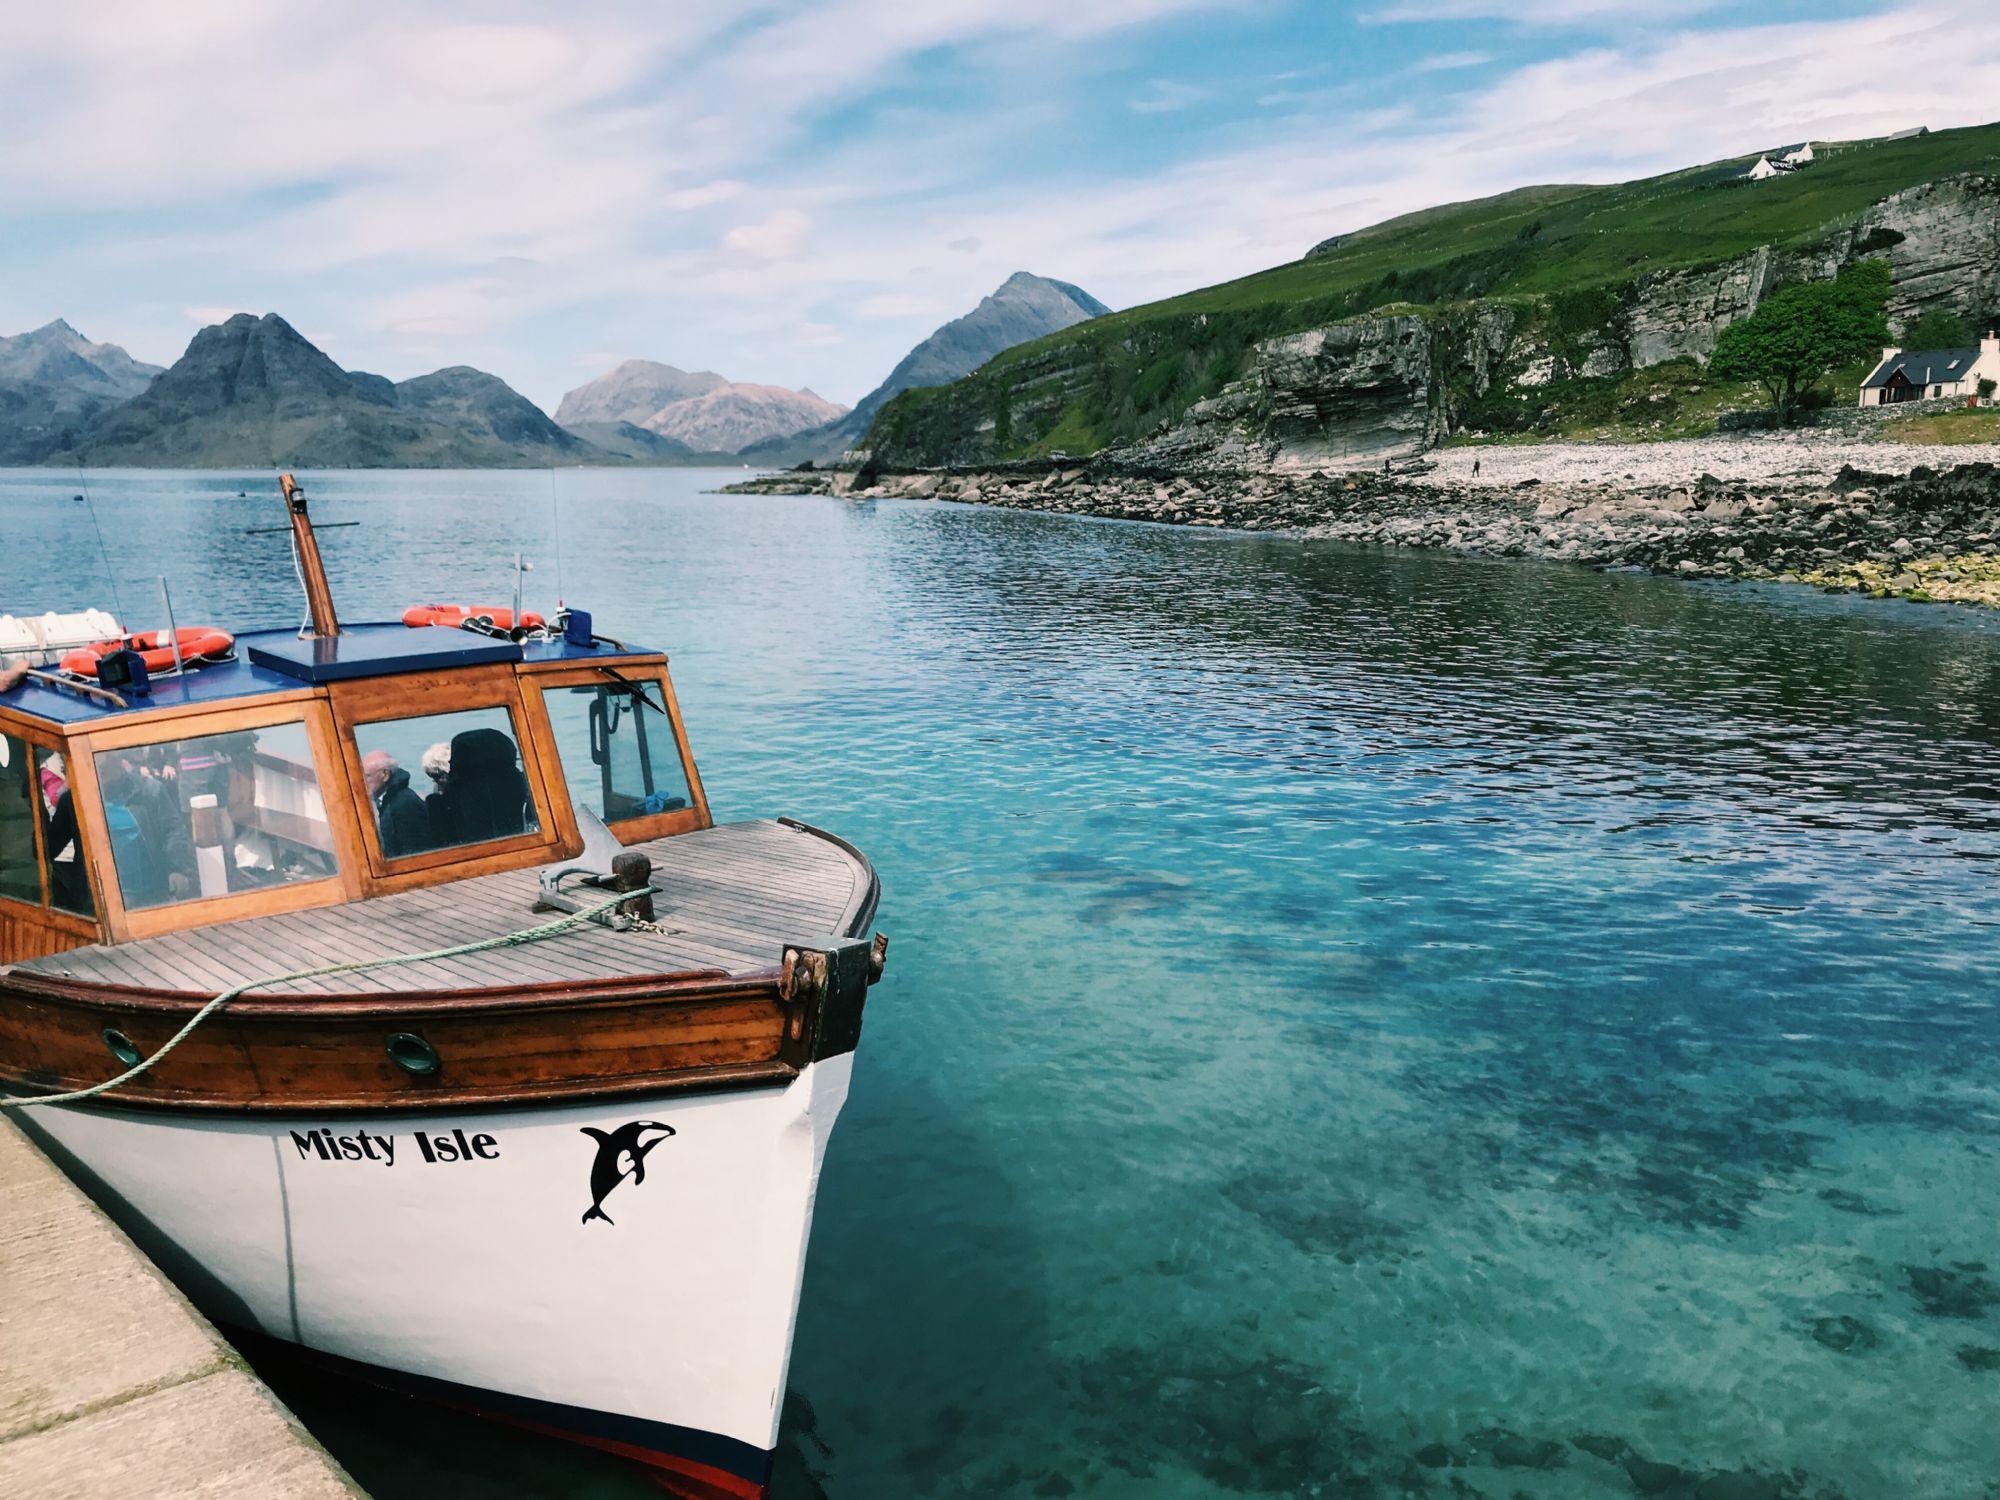 Misty Isles boat